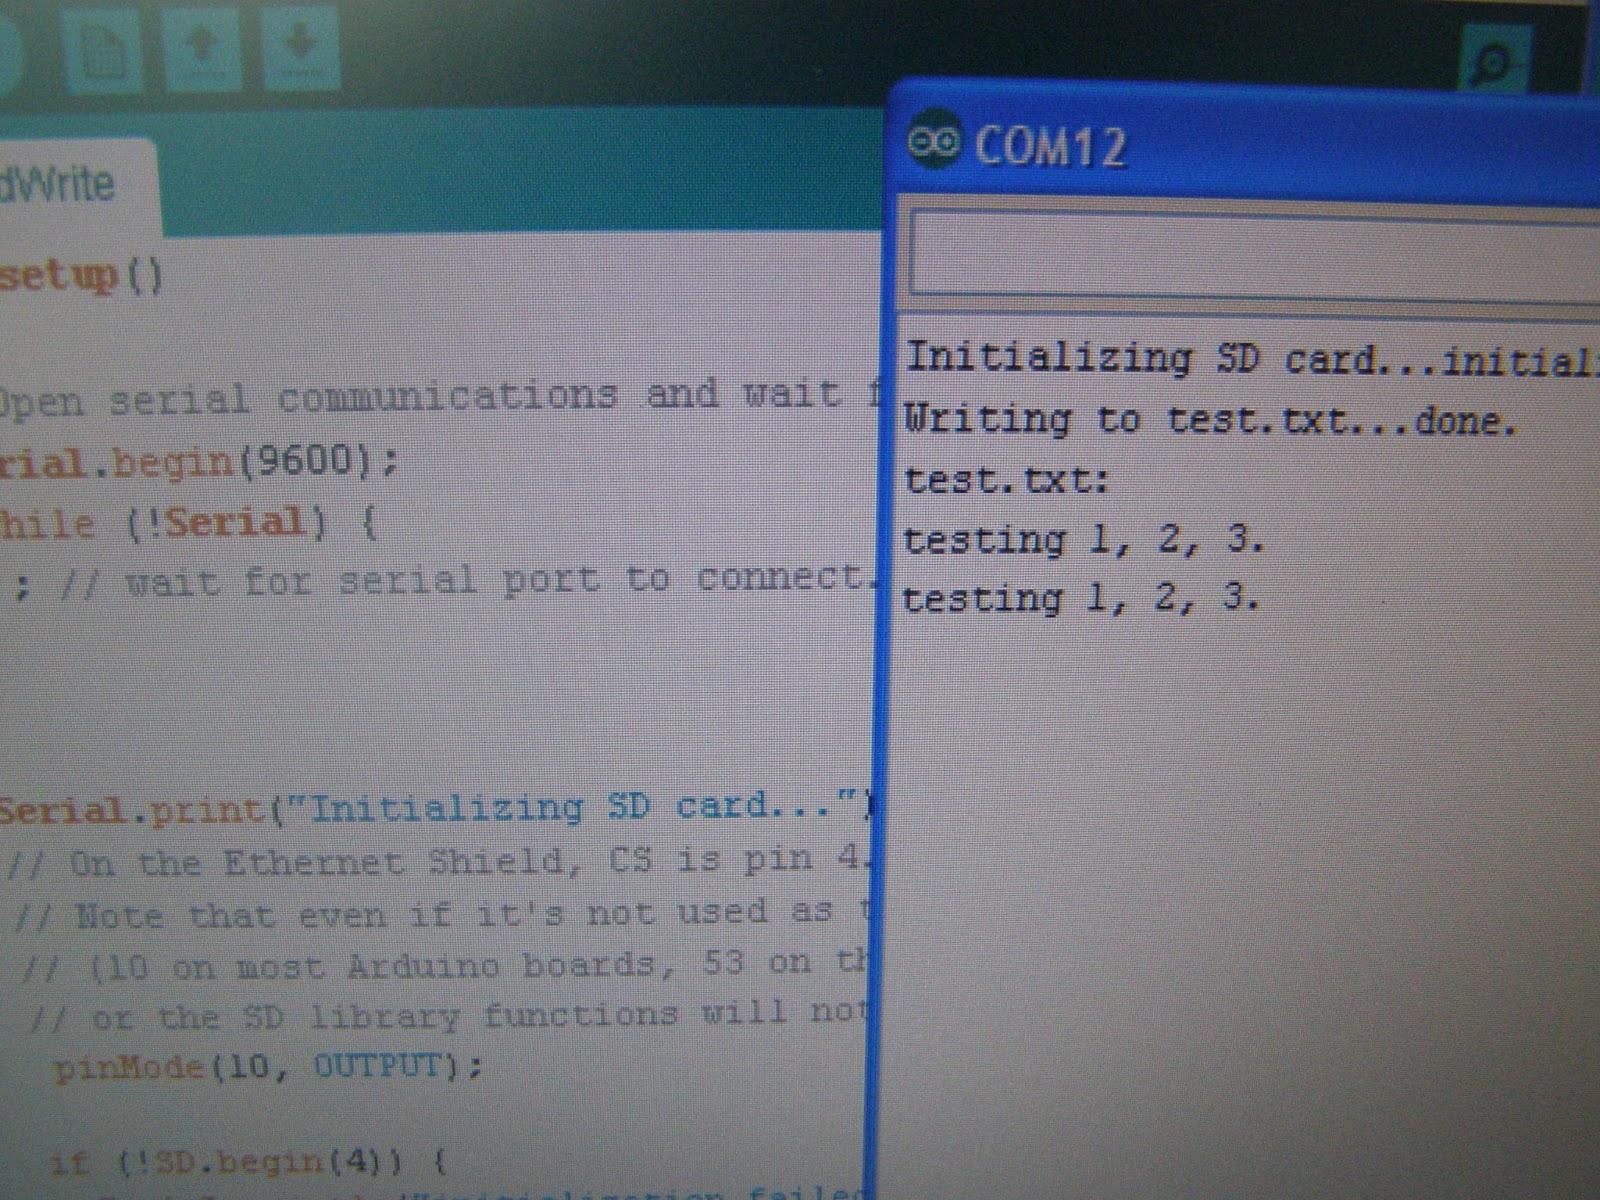 Notepad vs. fisiere binare - Forumul Softpedia